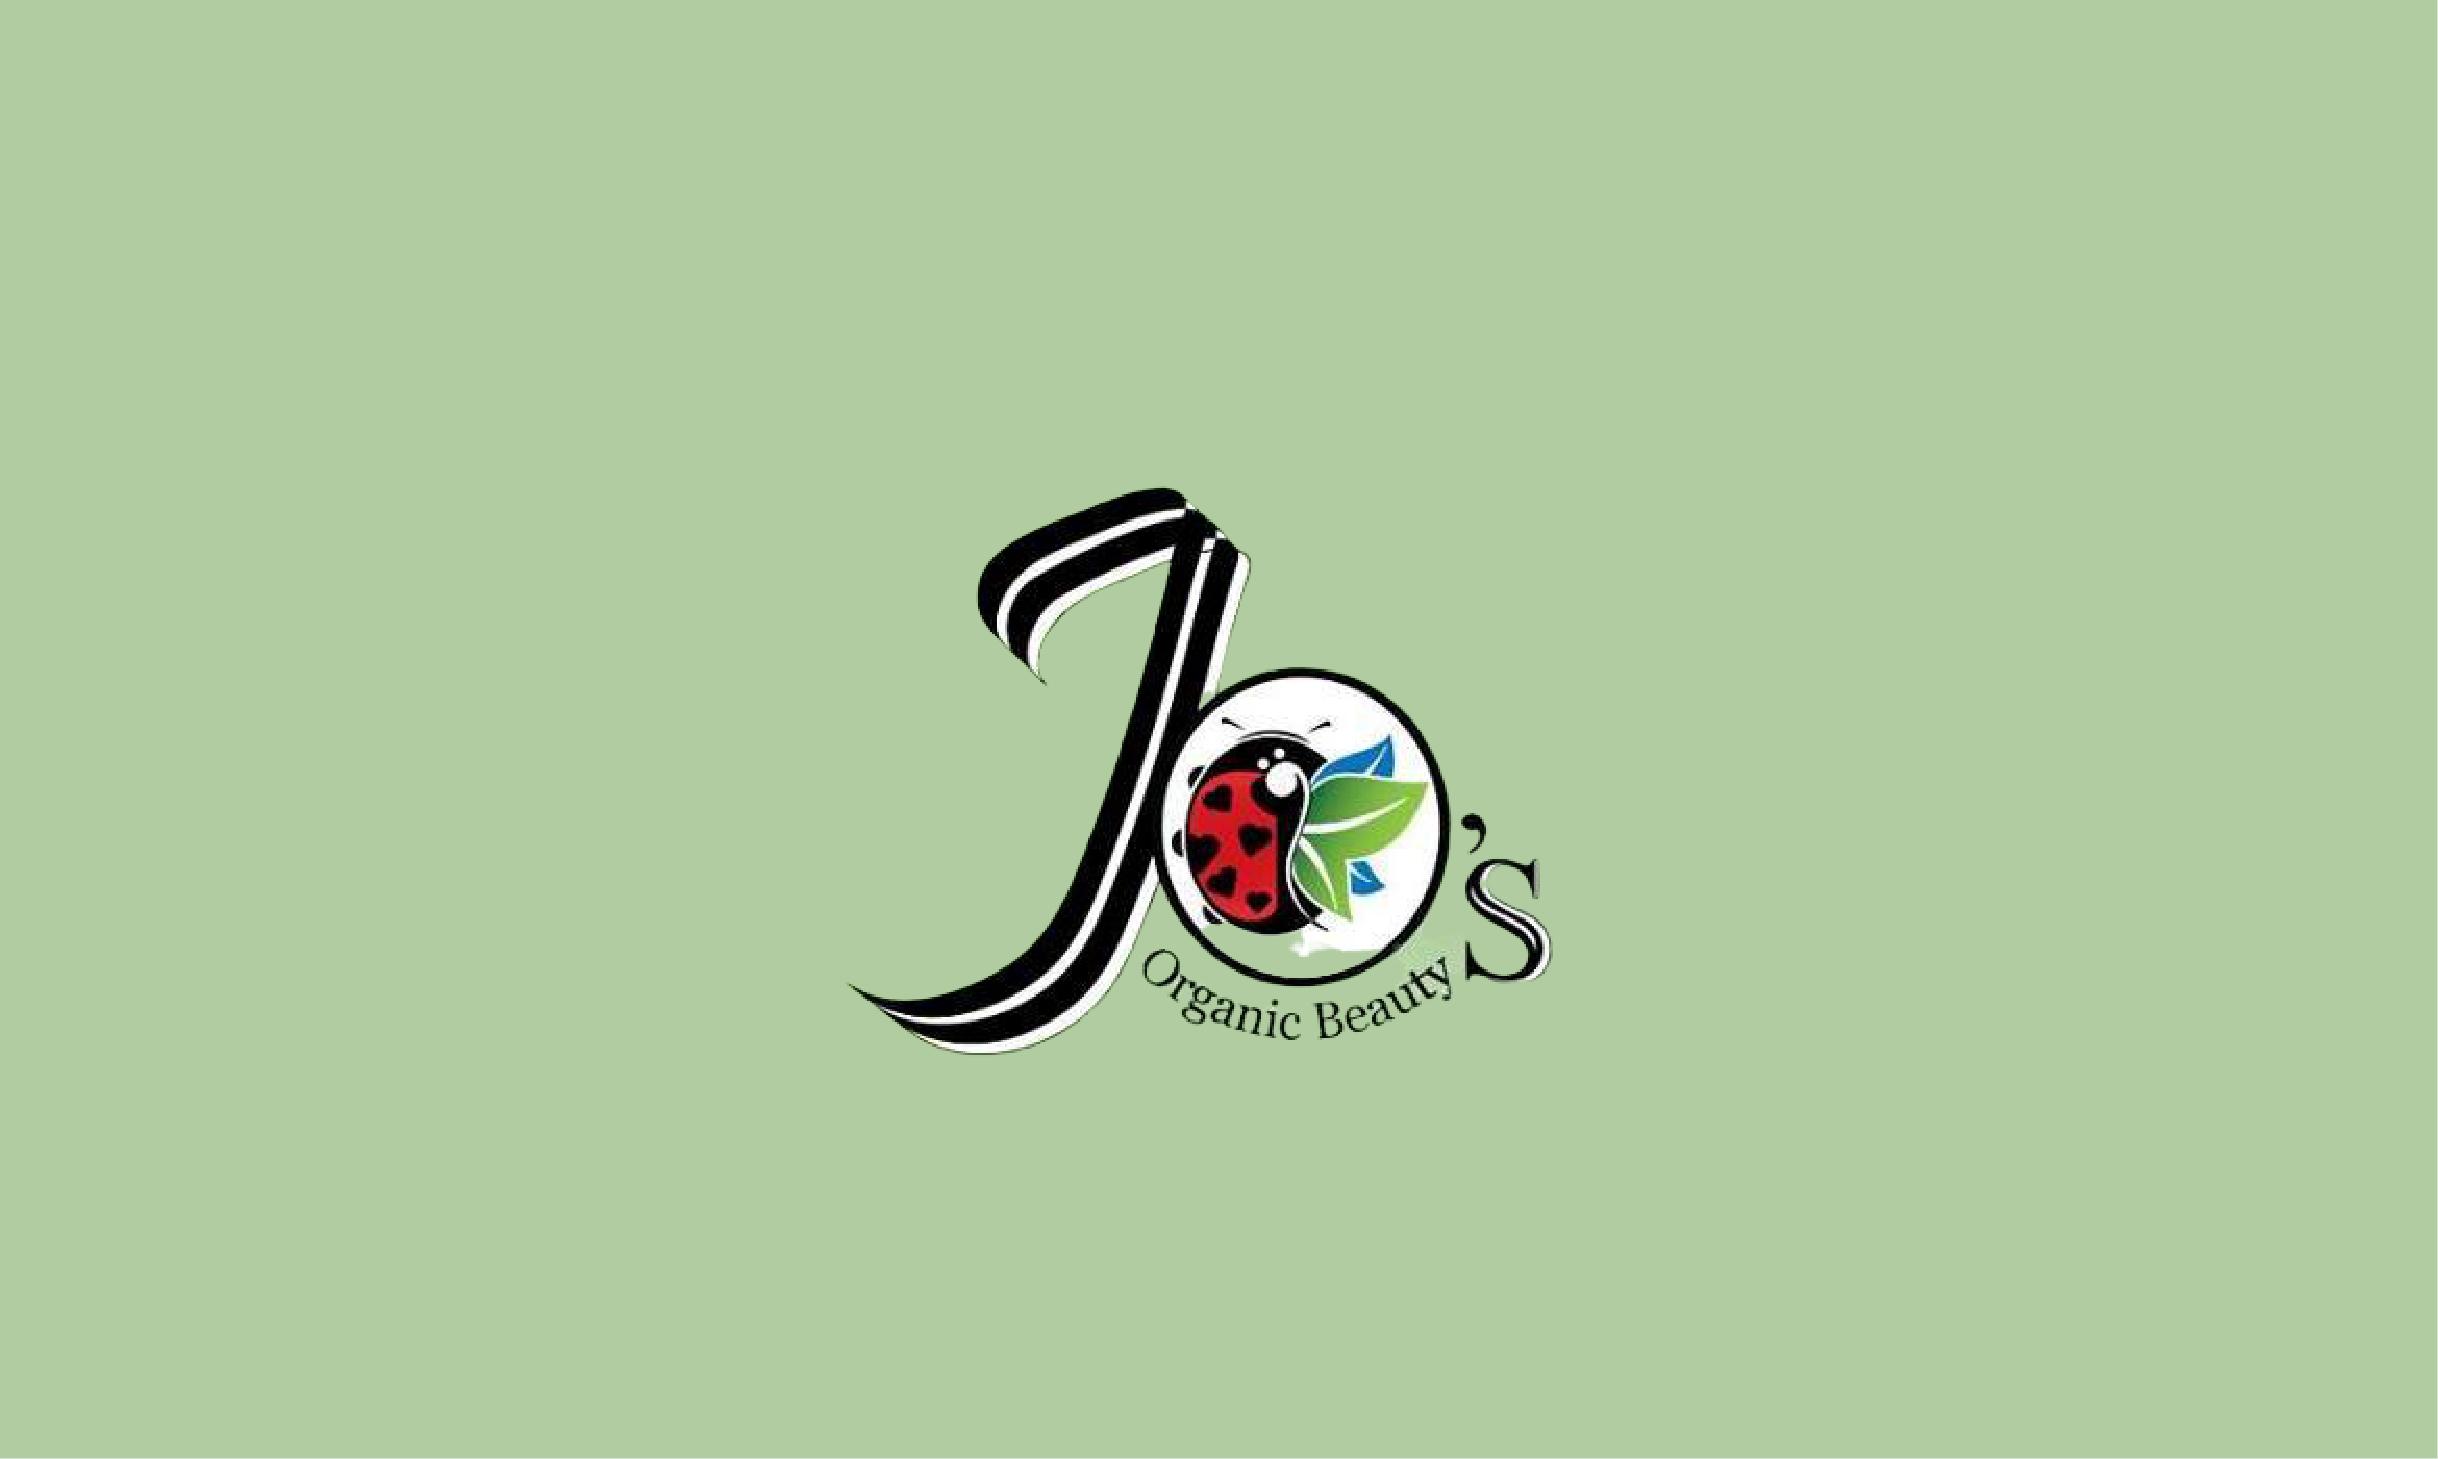 jos organic beauty JOs Organic Beauty Portfolio feature image JO Our Work Our Work Portfolio feature image JO